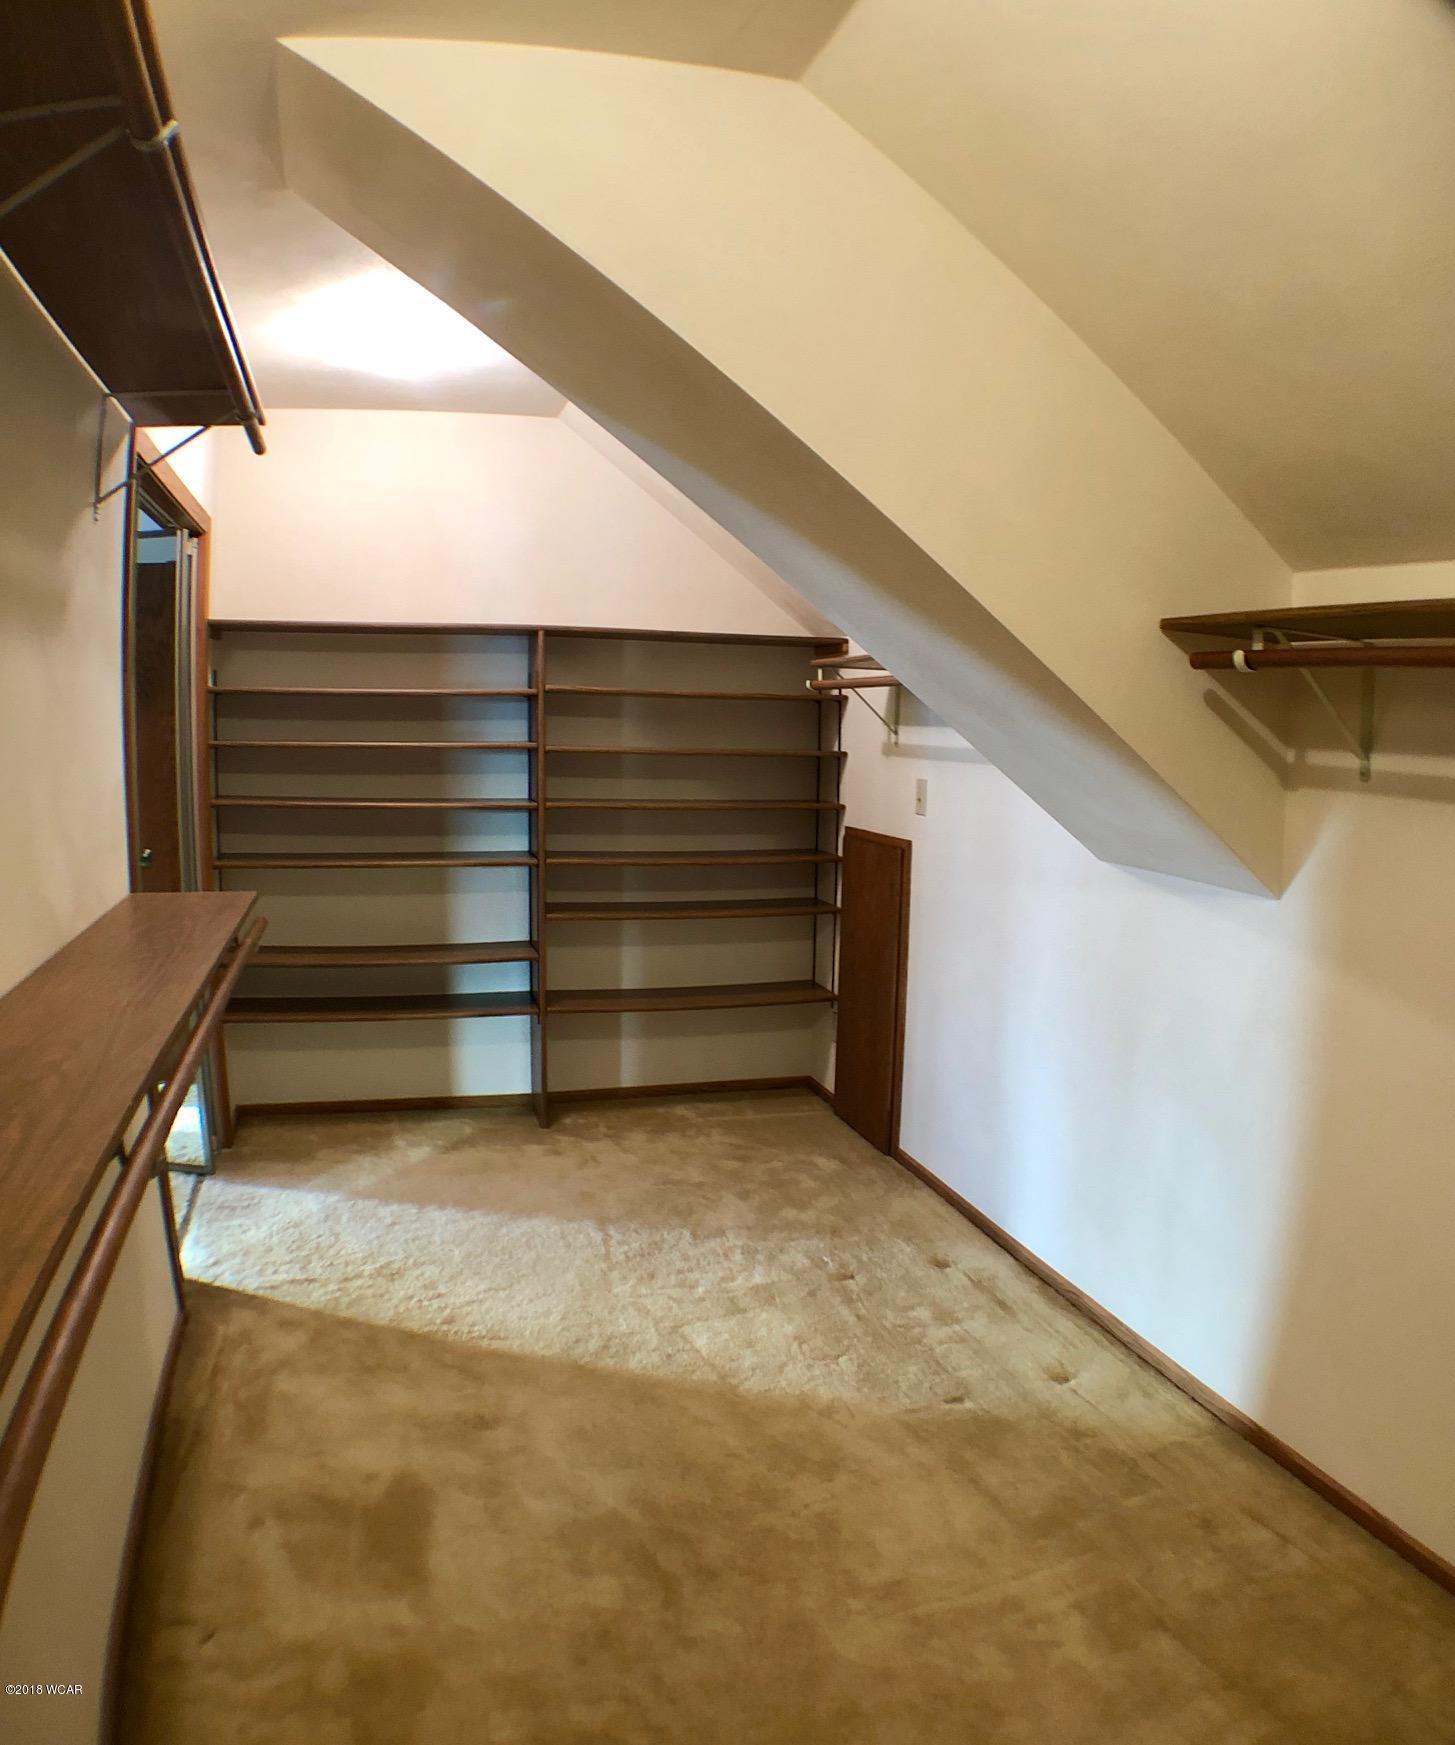 70685 360th Street,Morton,4 Bedrooms Bedrooms,3 BathroomsBathrooms,Single Family,360th Street,6033160